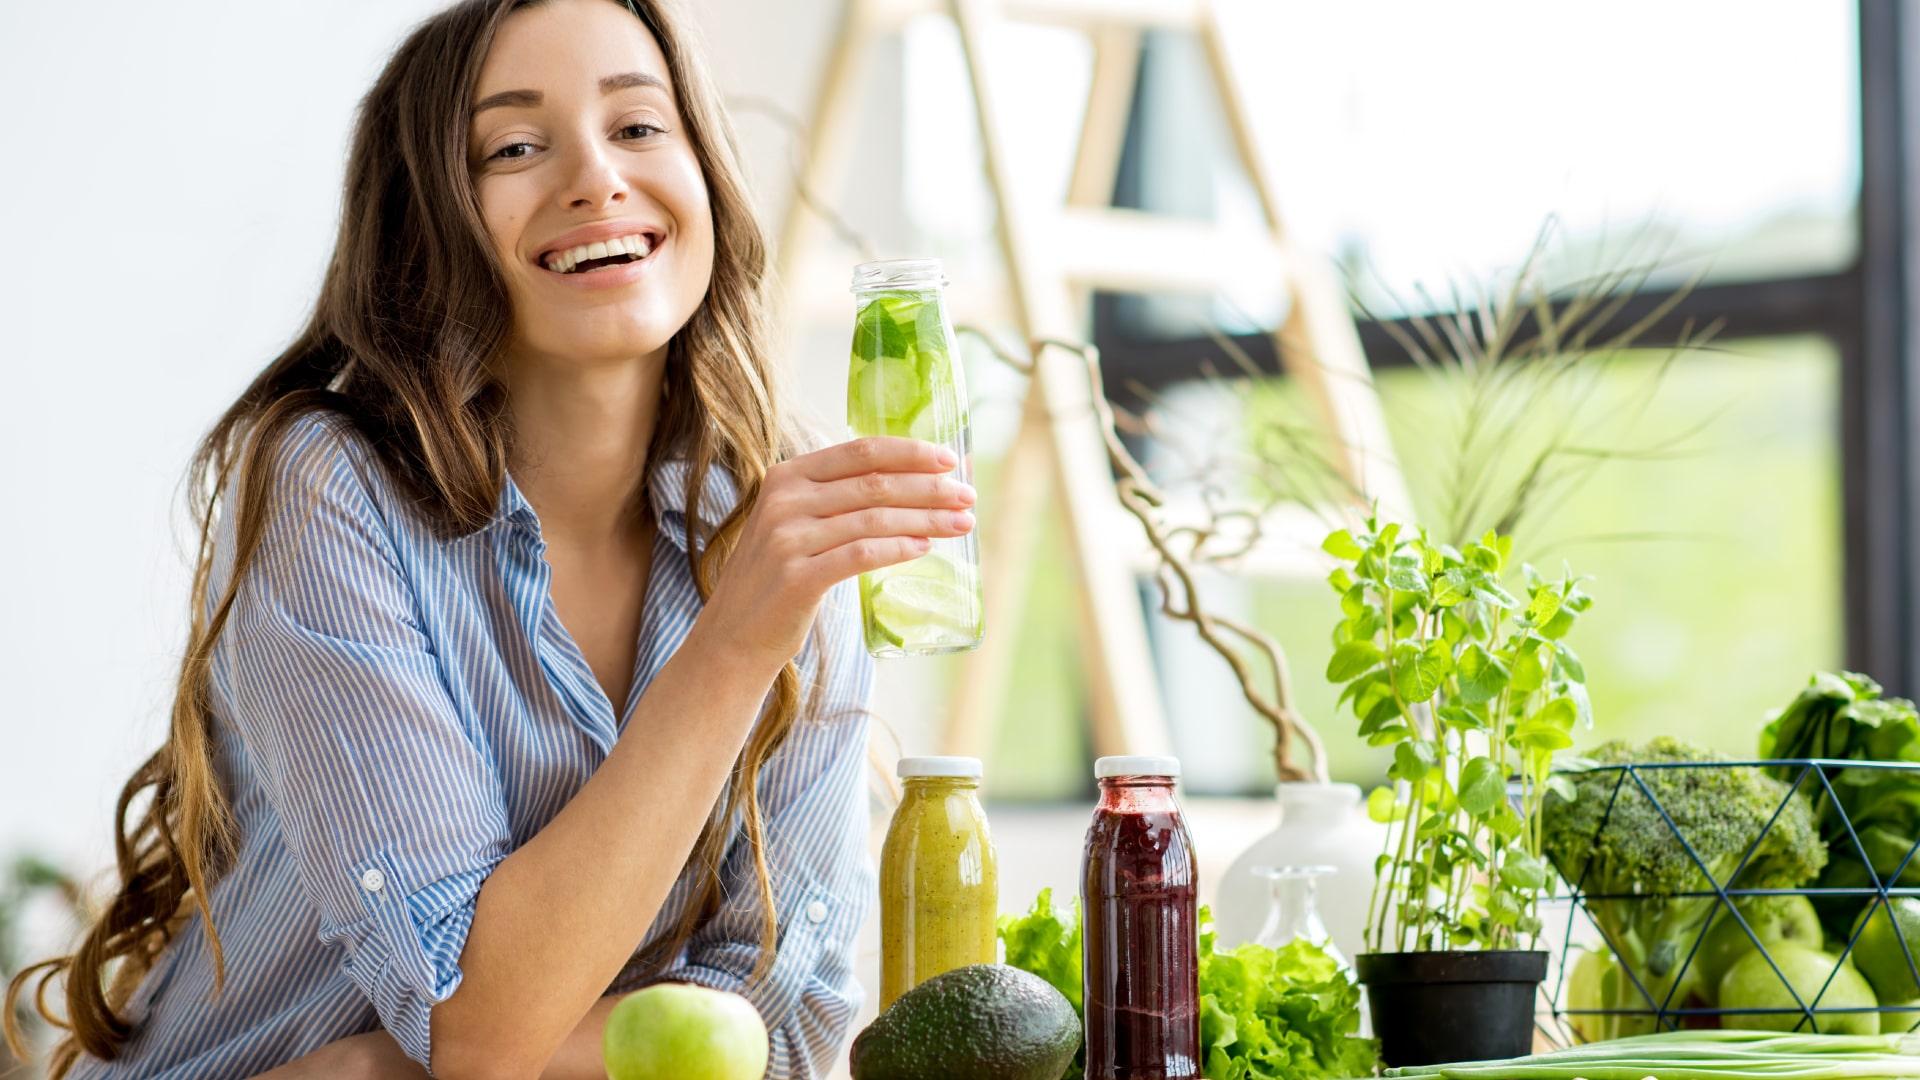 vegan keto diet, Vegetarian Keto Diet, girl with lemon juice